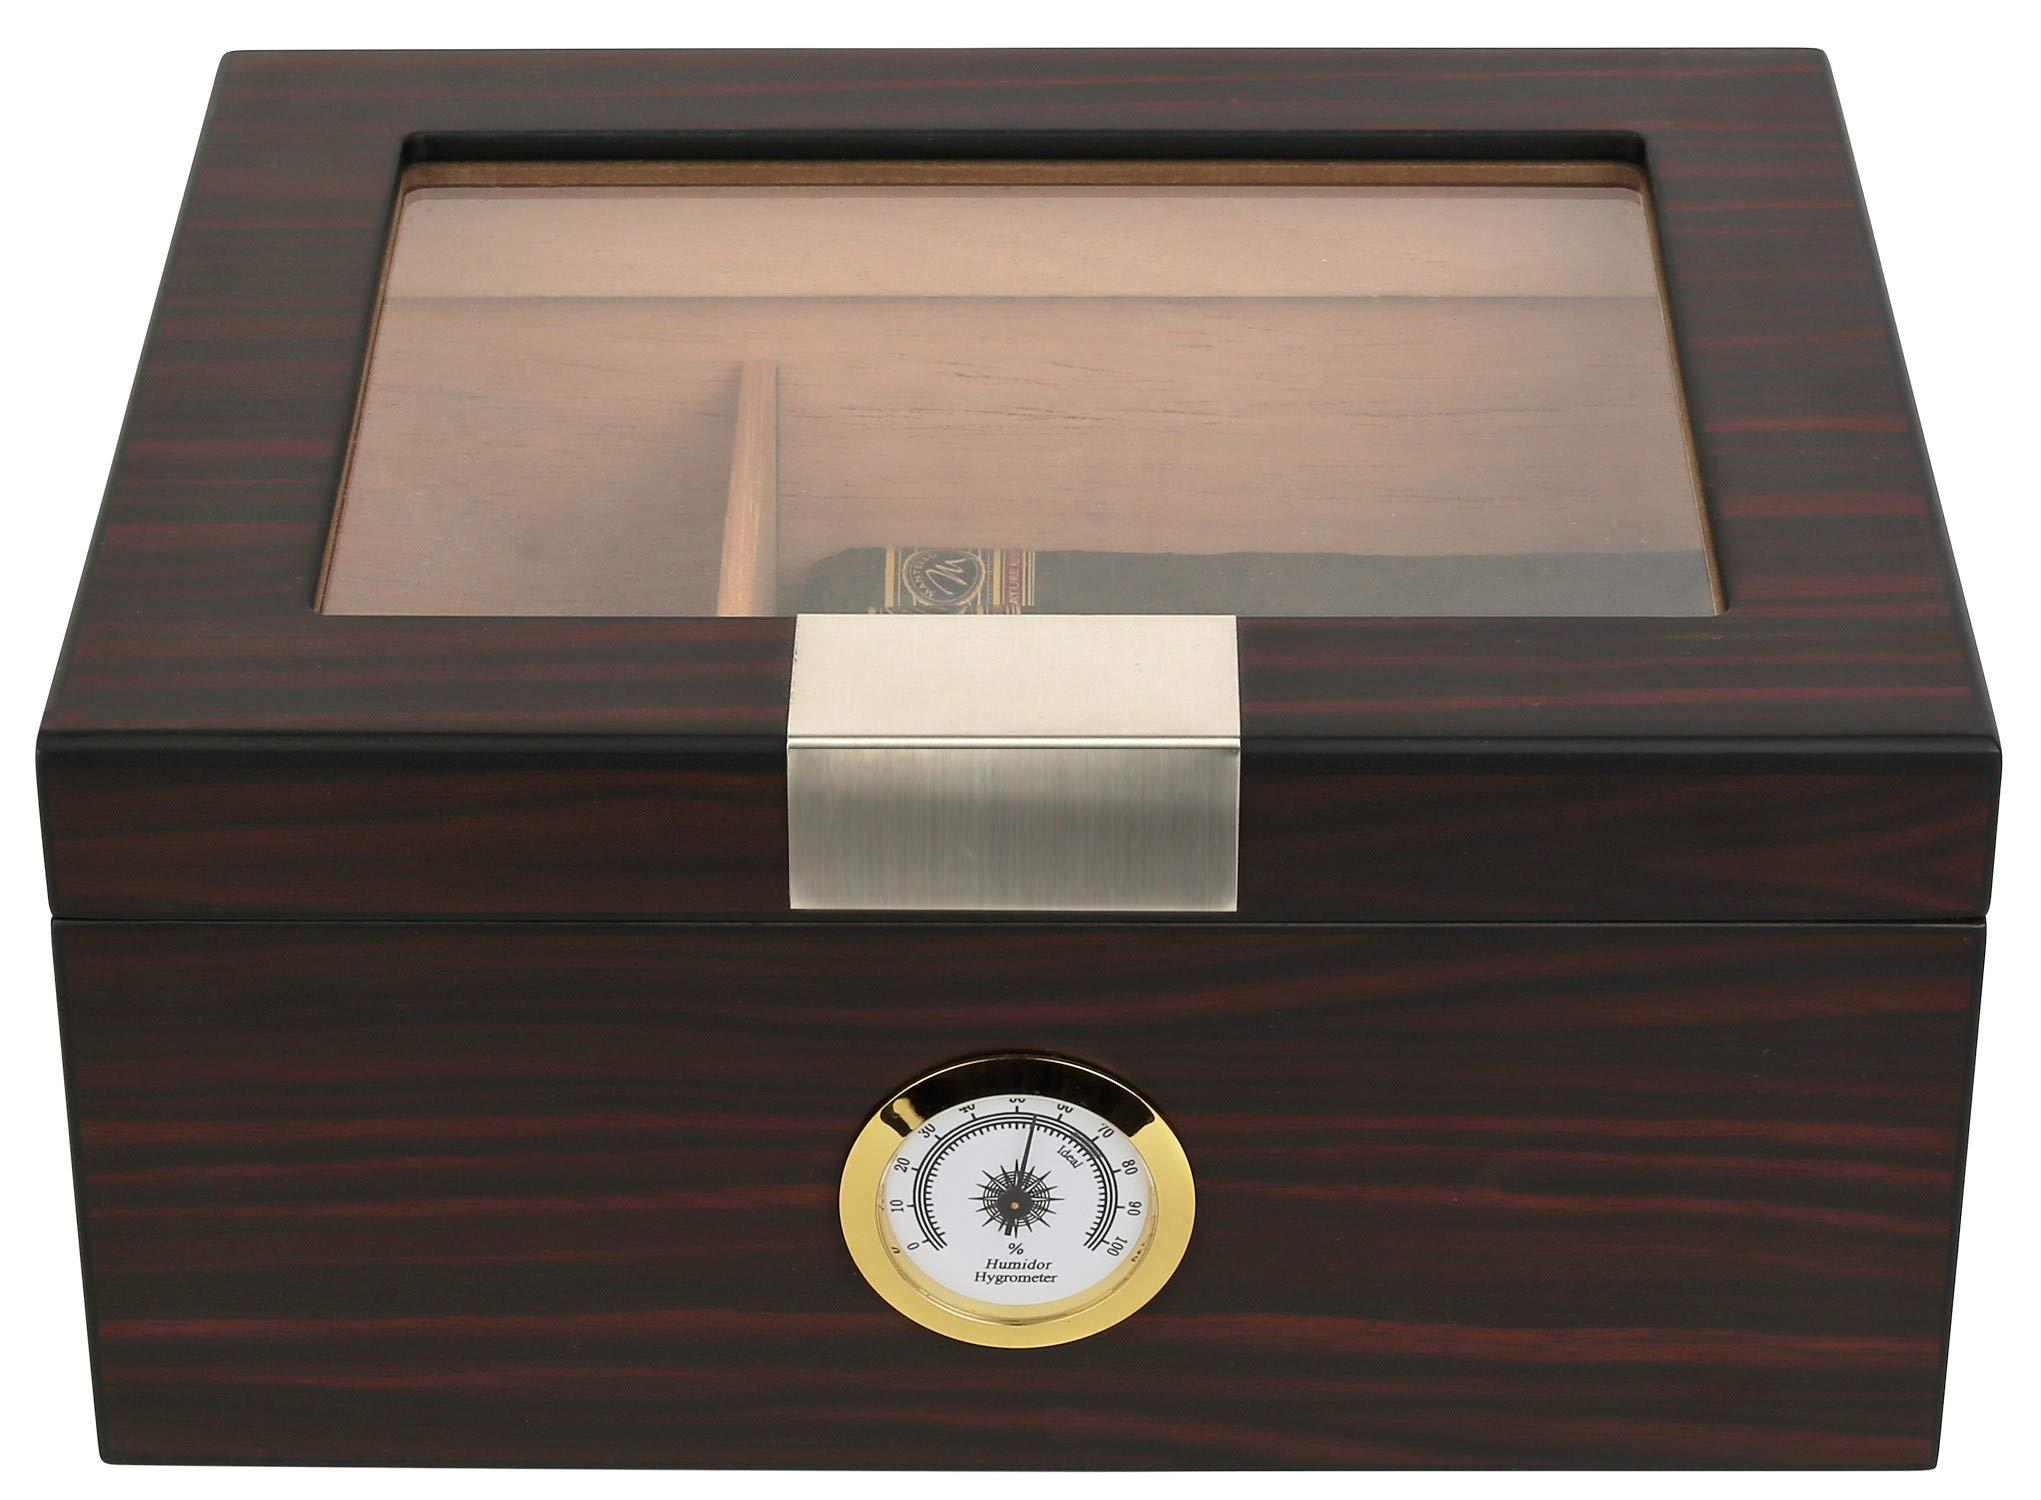 Mantello 25-50 Cigar Humidor with Tray Divider for 2-Way Humidity Packs, Ebony Glass Top by Mantello Cigars